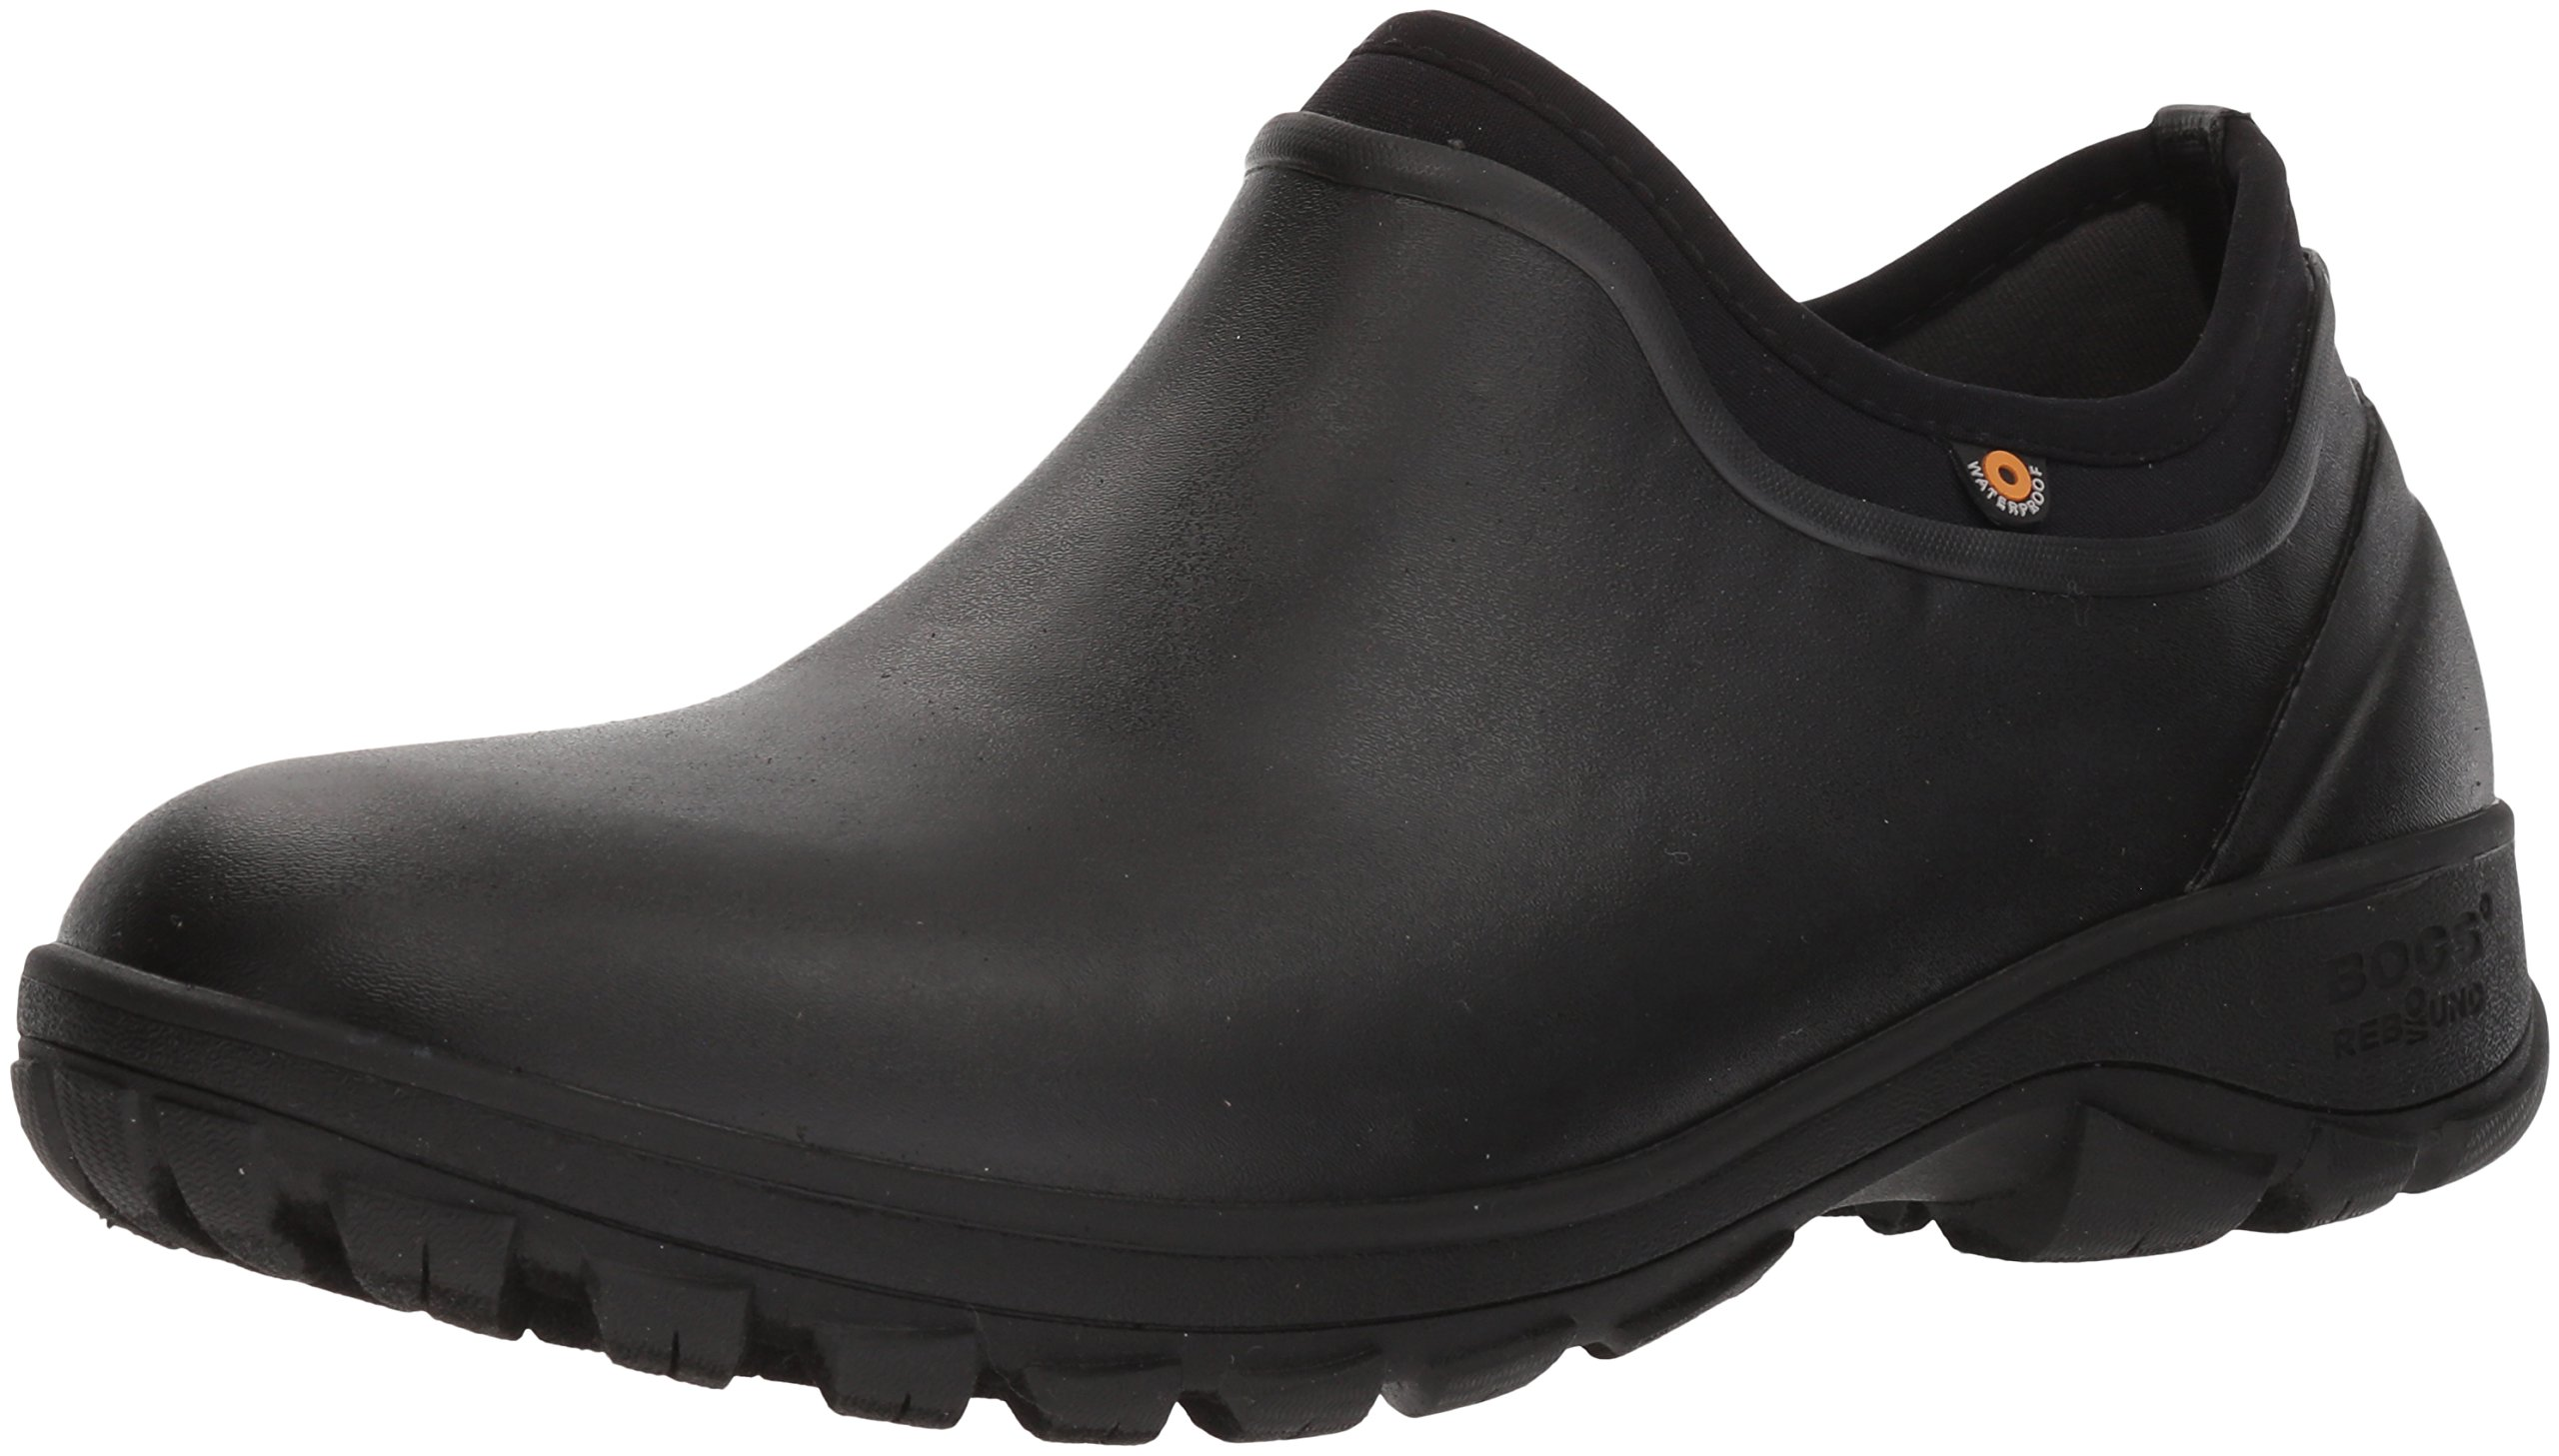 Bogs Men's Sauvie Slip On Soft Toe Rain Boot, Black, 12 D(M) US by BOGS